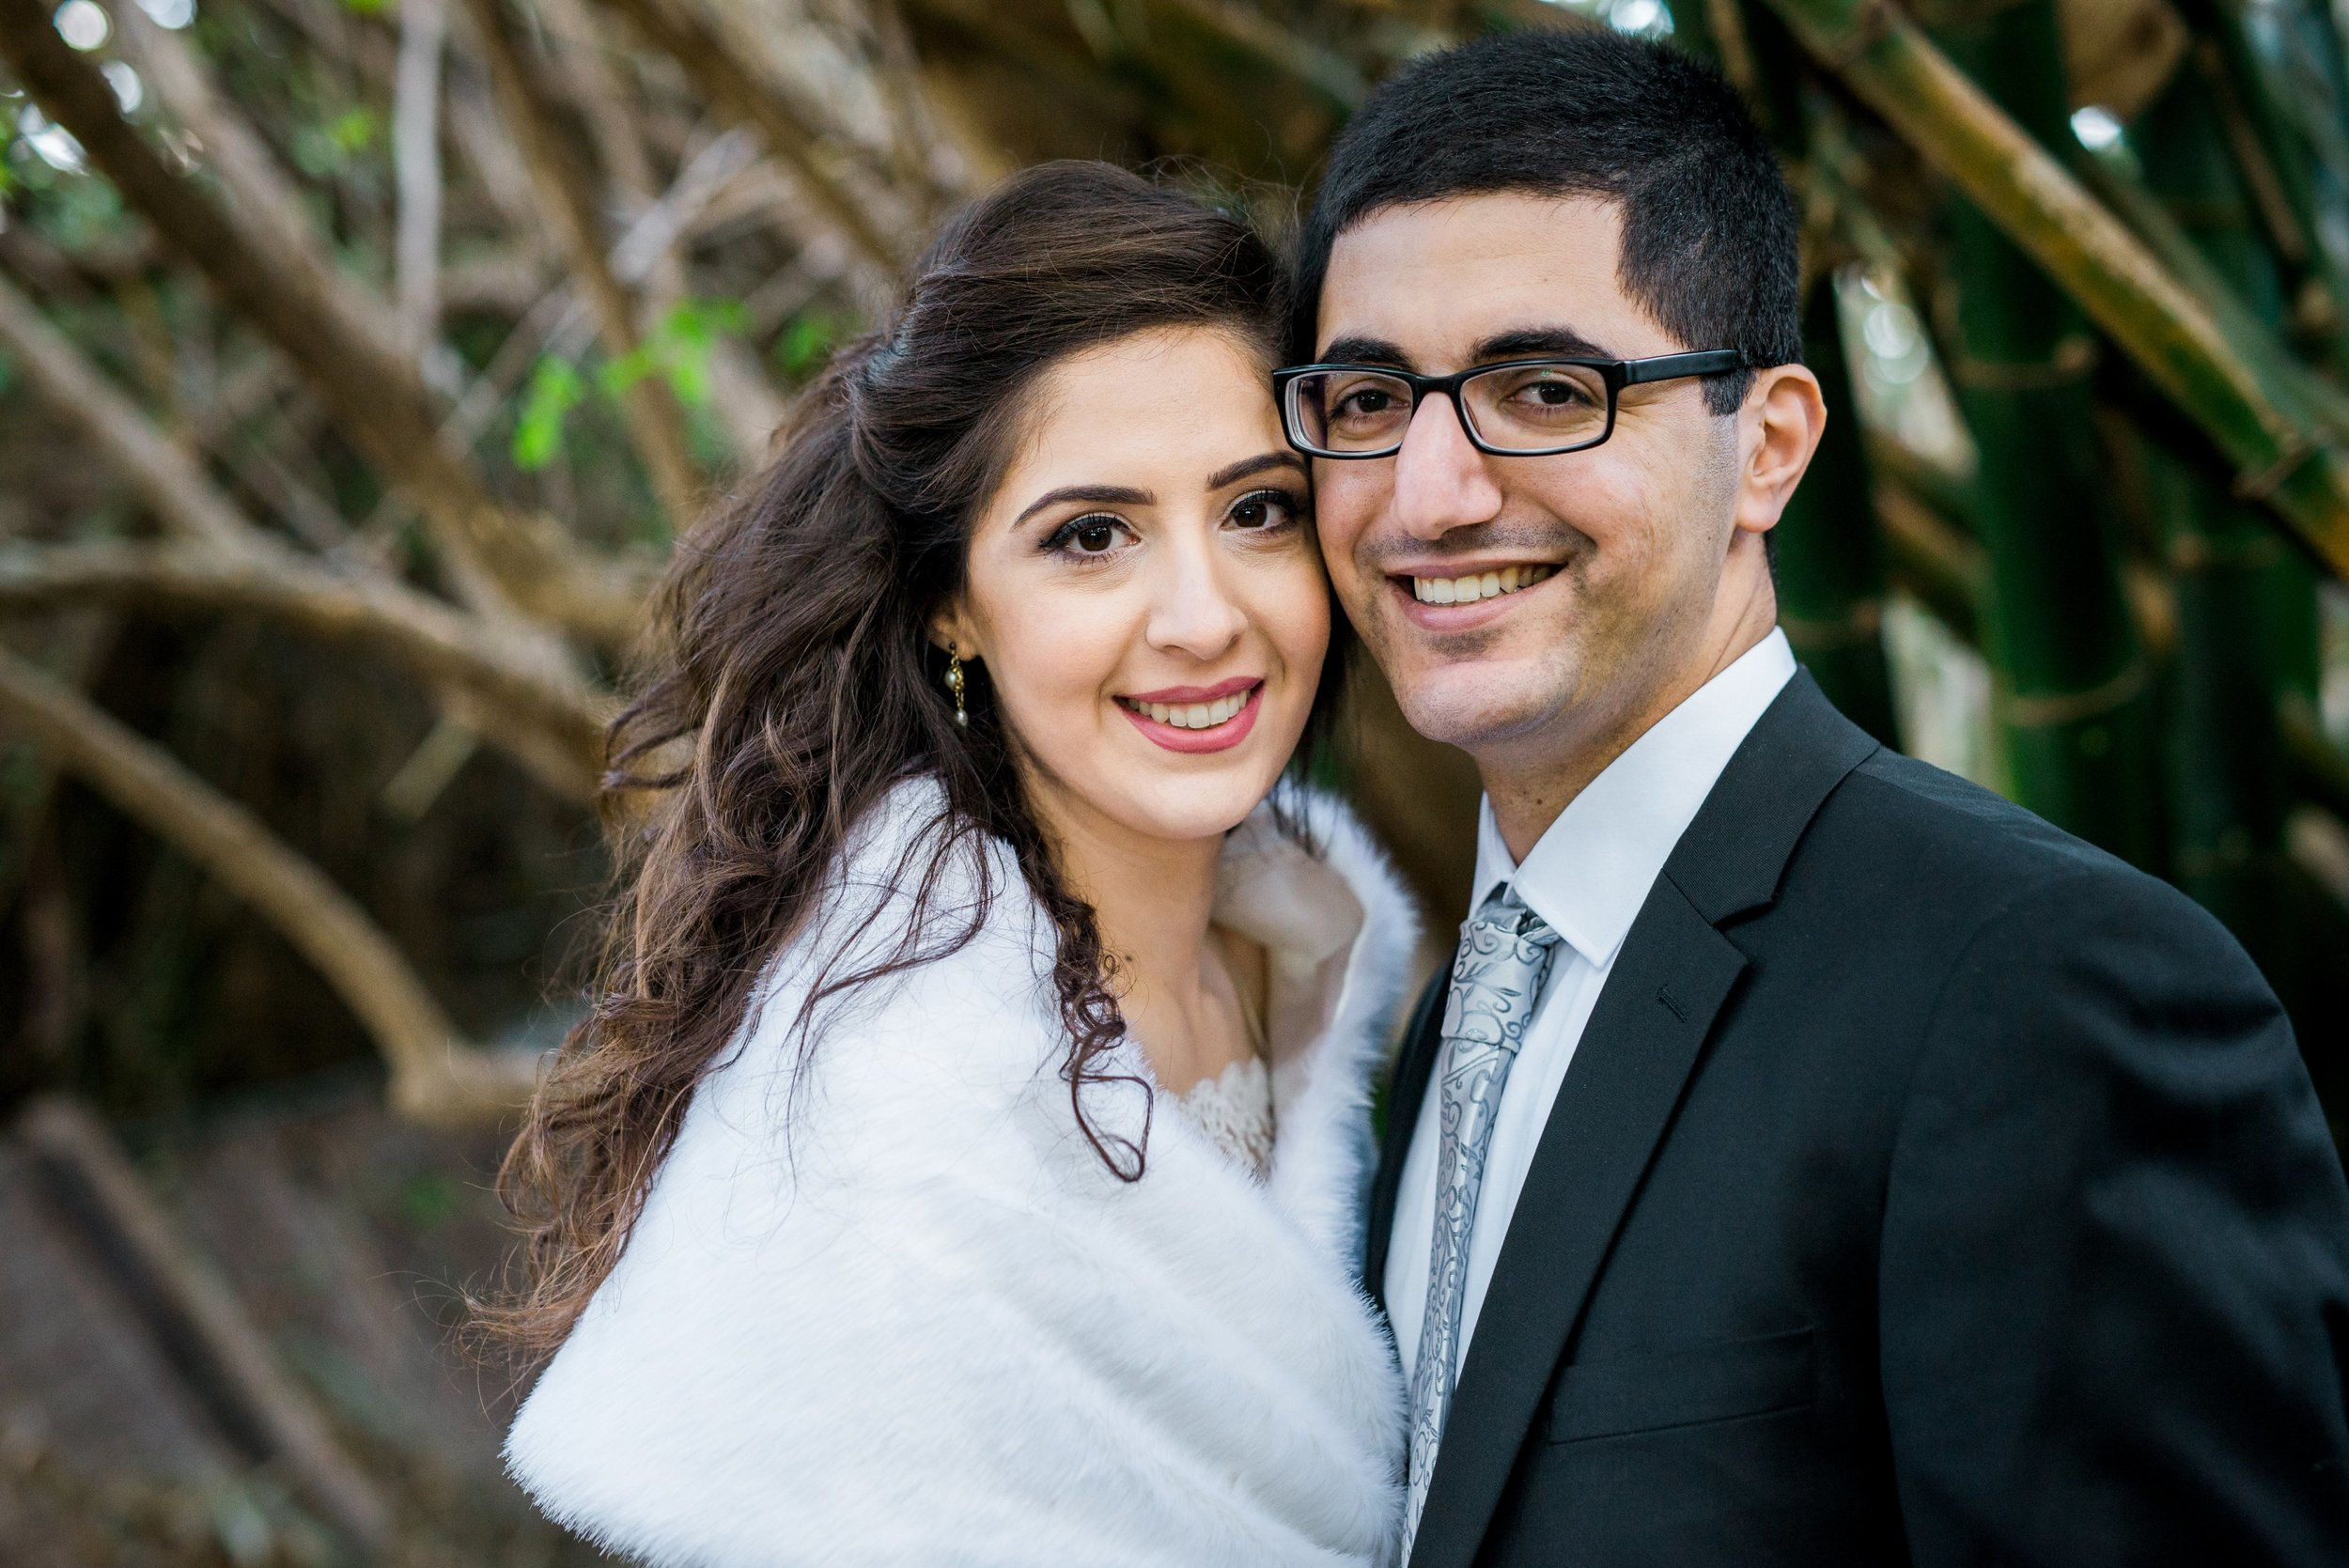 israel-garden-wedding-portraits-session-kate-giryes-photography--34_WEB.jpg